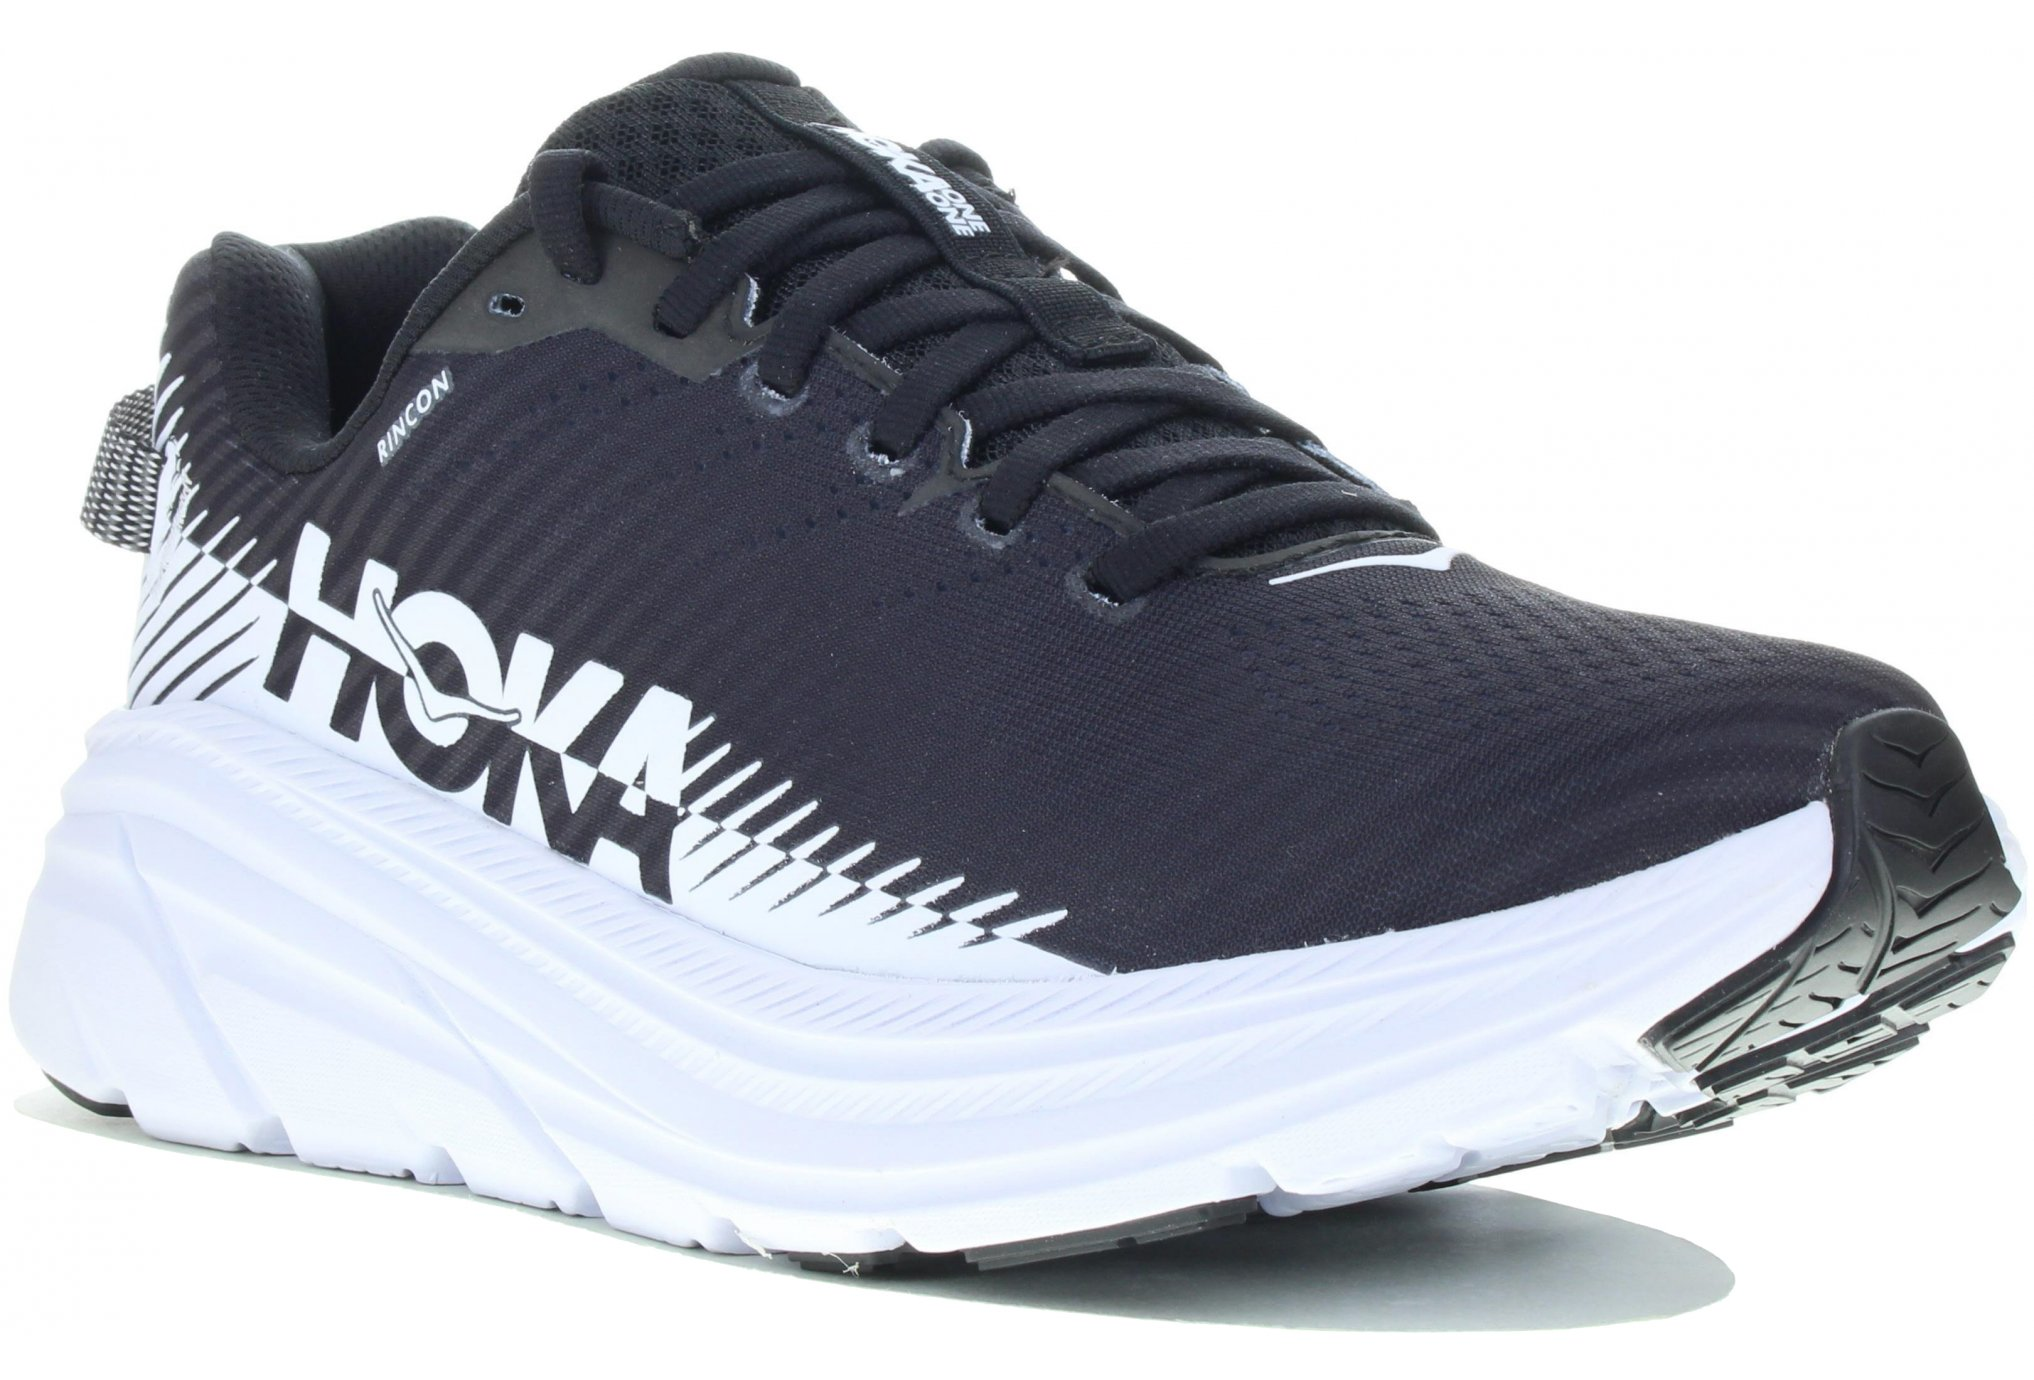 Hoka One One Rincon 2 Chaussures running femme